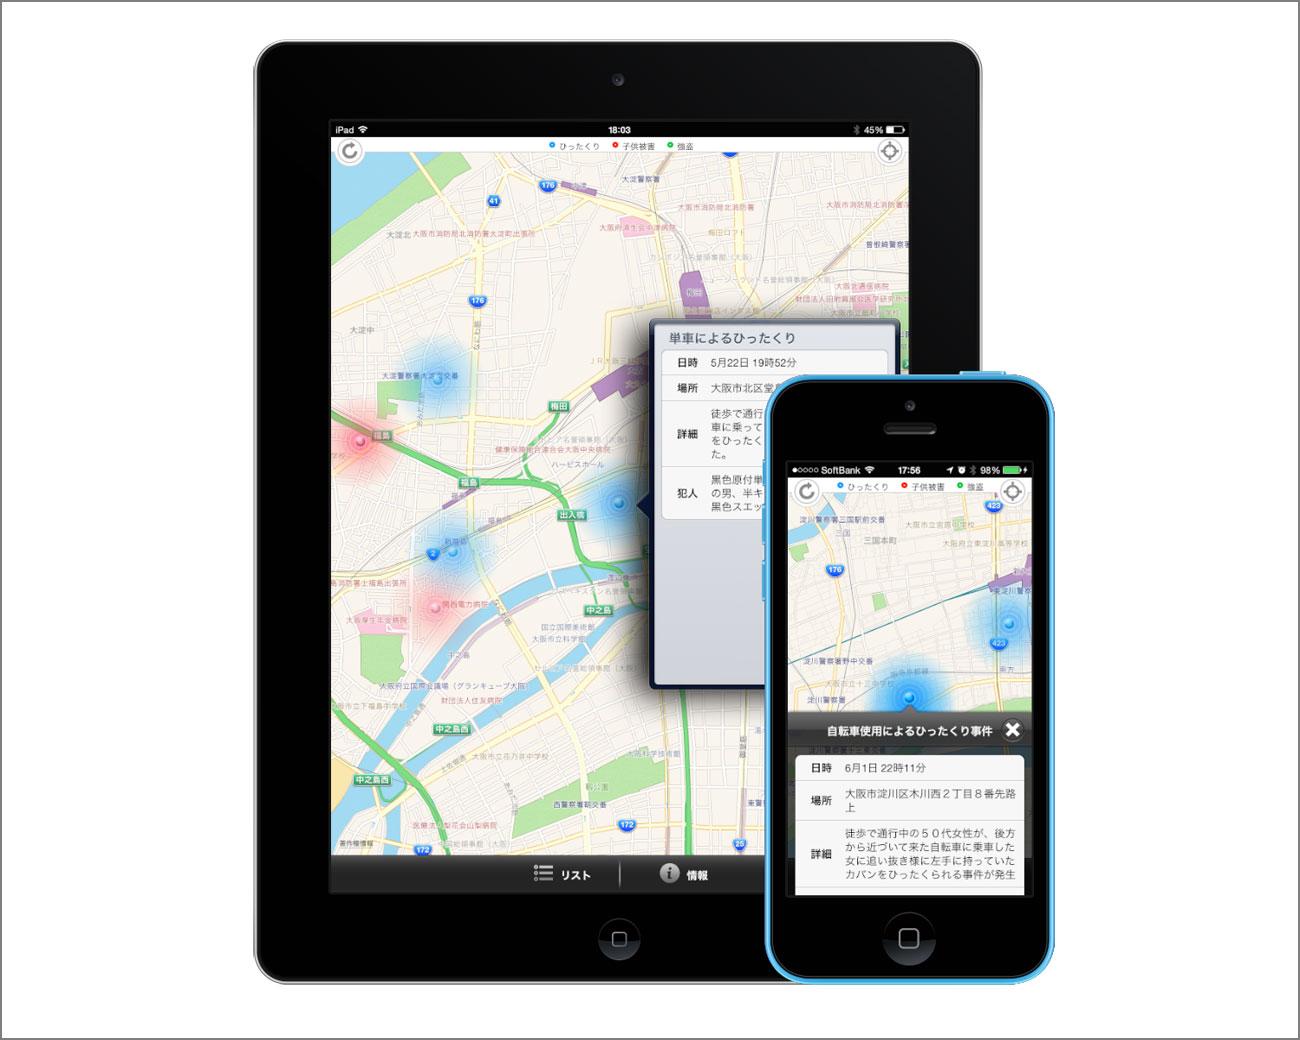 iPhone/iPad両対応のiOSユニバーサルアプリ、防犯マップ